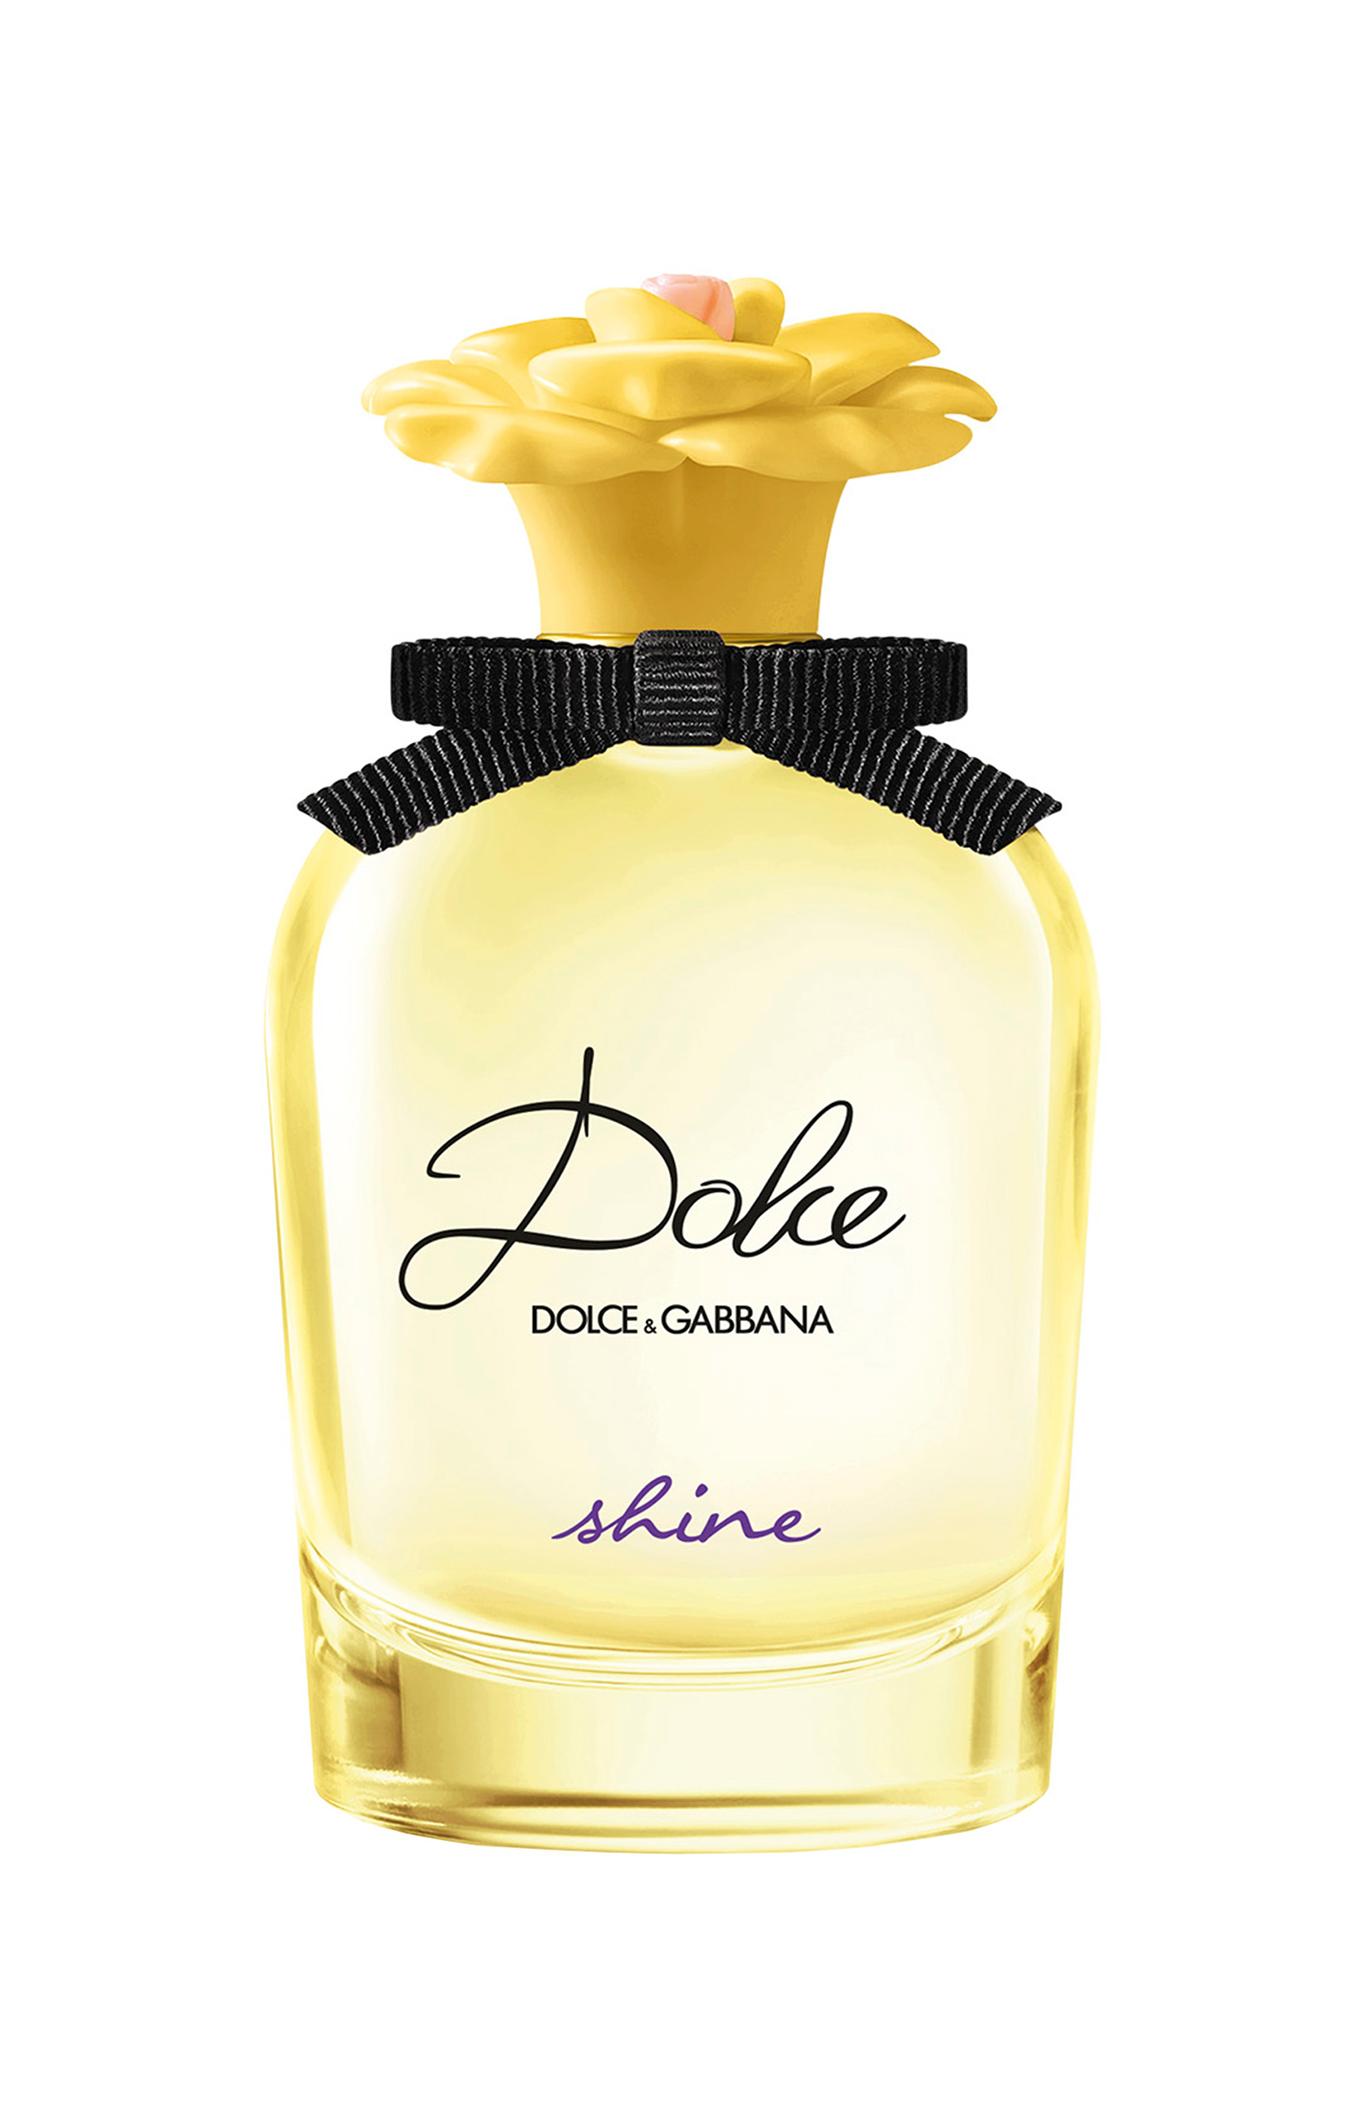 Купить Парфюмерная вода Dolce & Gabbana Dolce Shine Eau De Parfum 75 мл, DOLCE&GABBANA